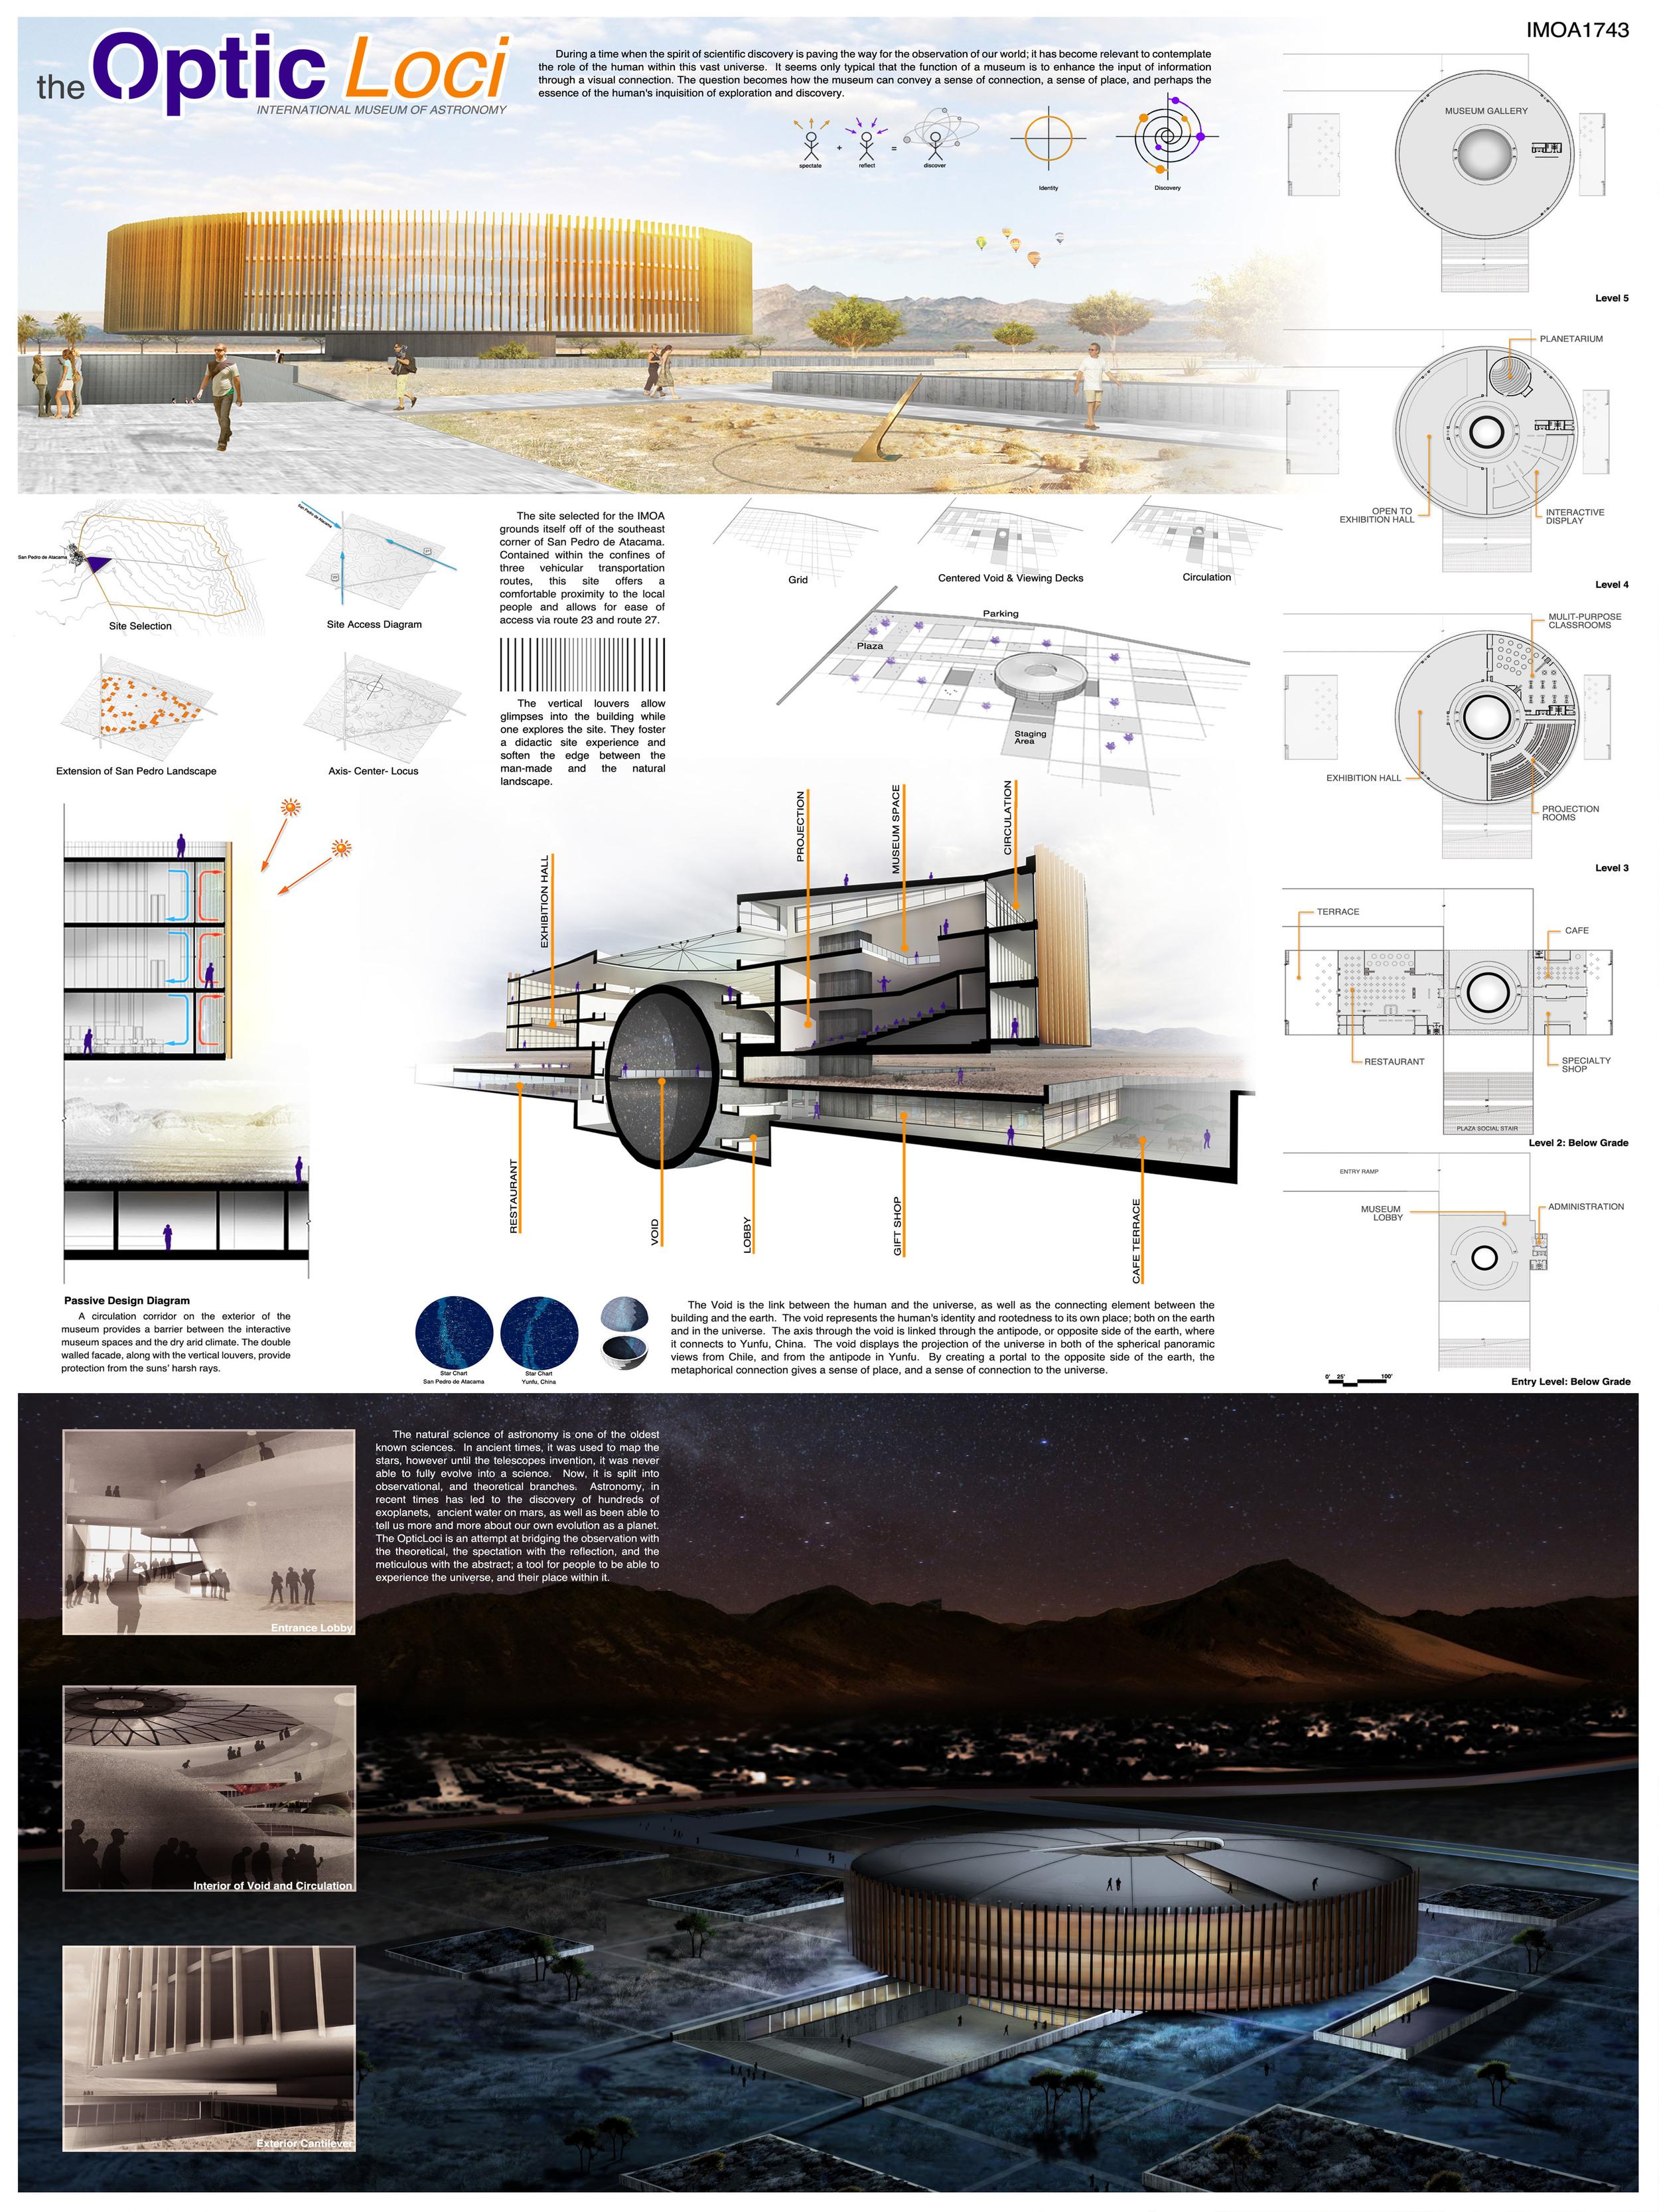 Project Collaboration: Adam Clark & Jeff Barr